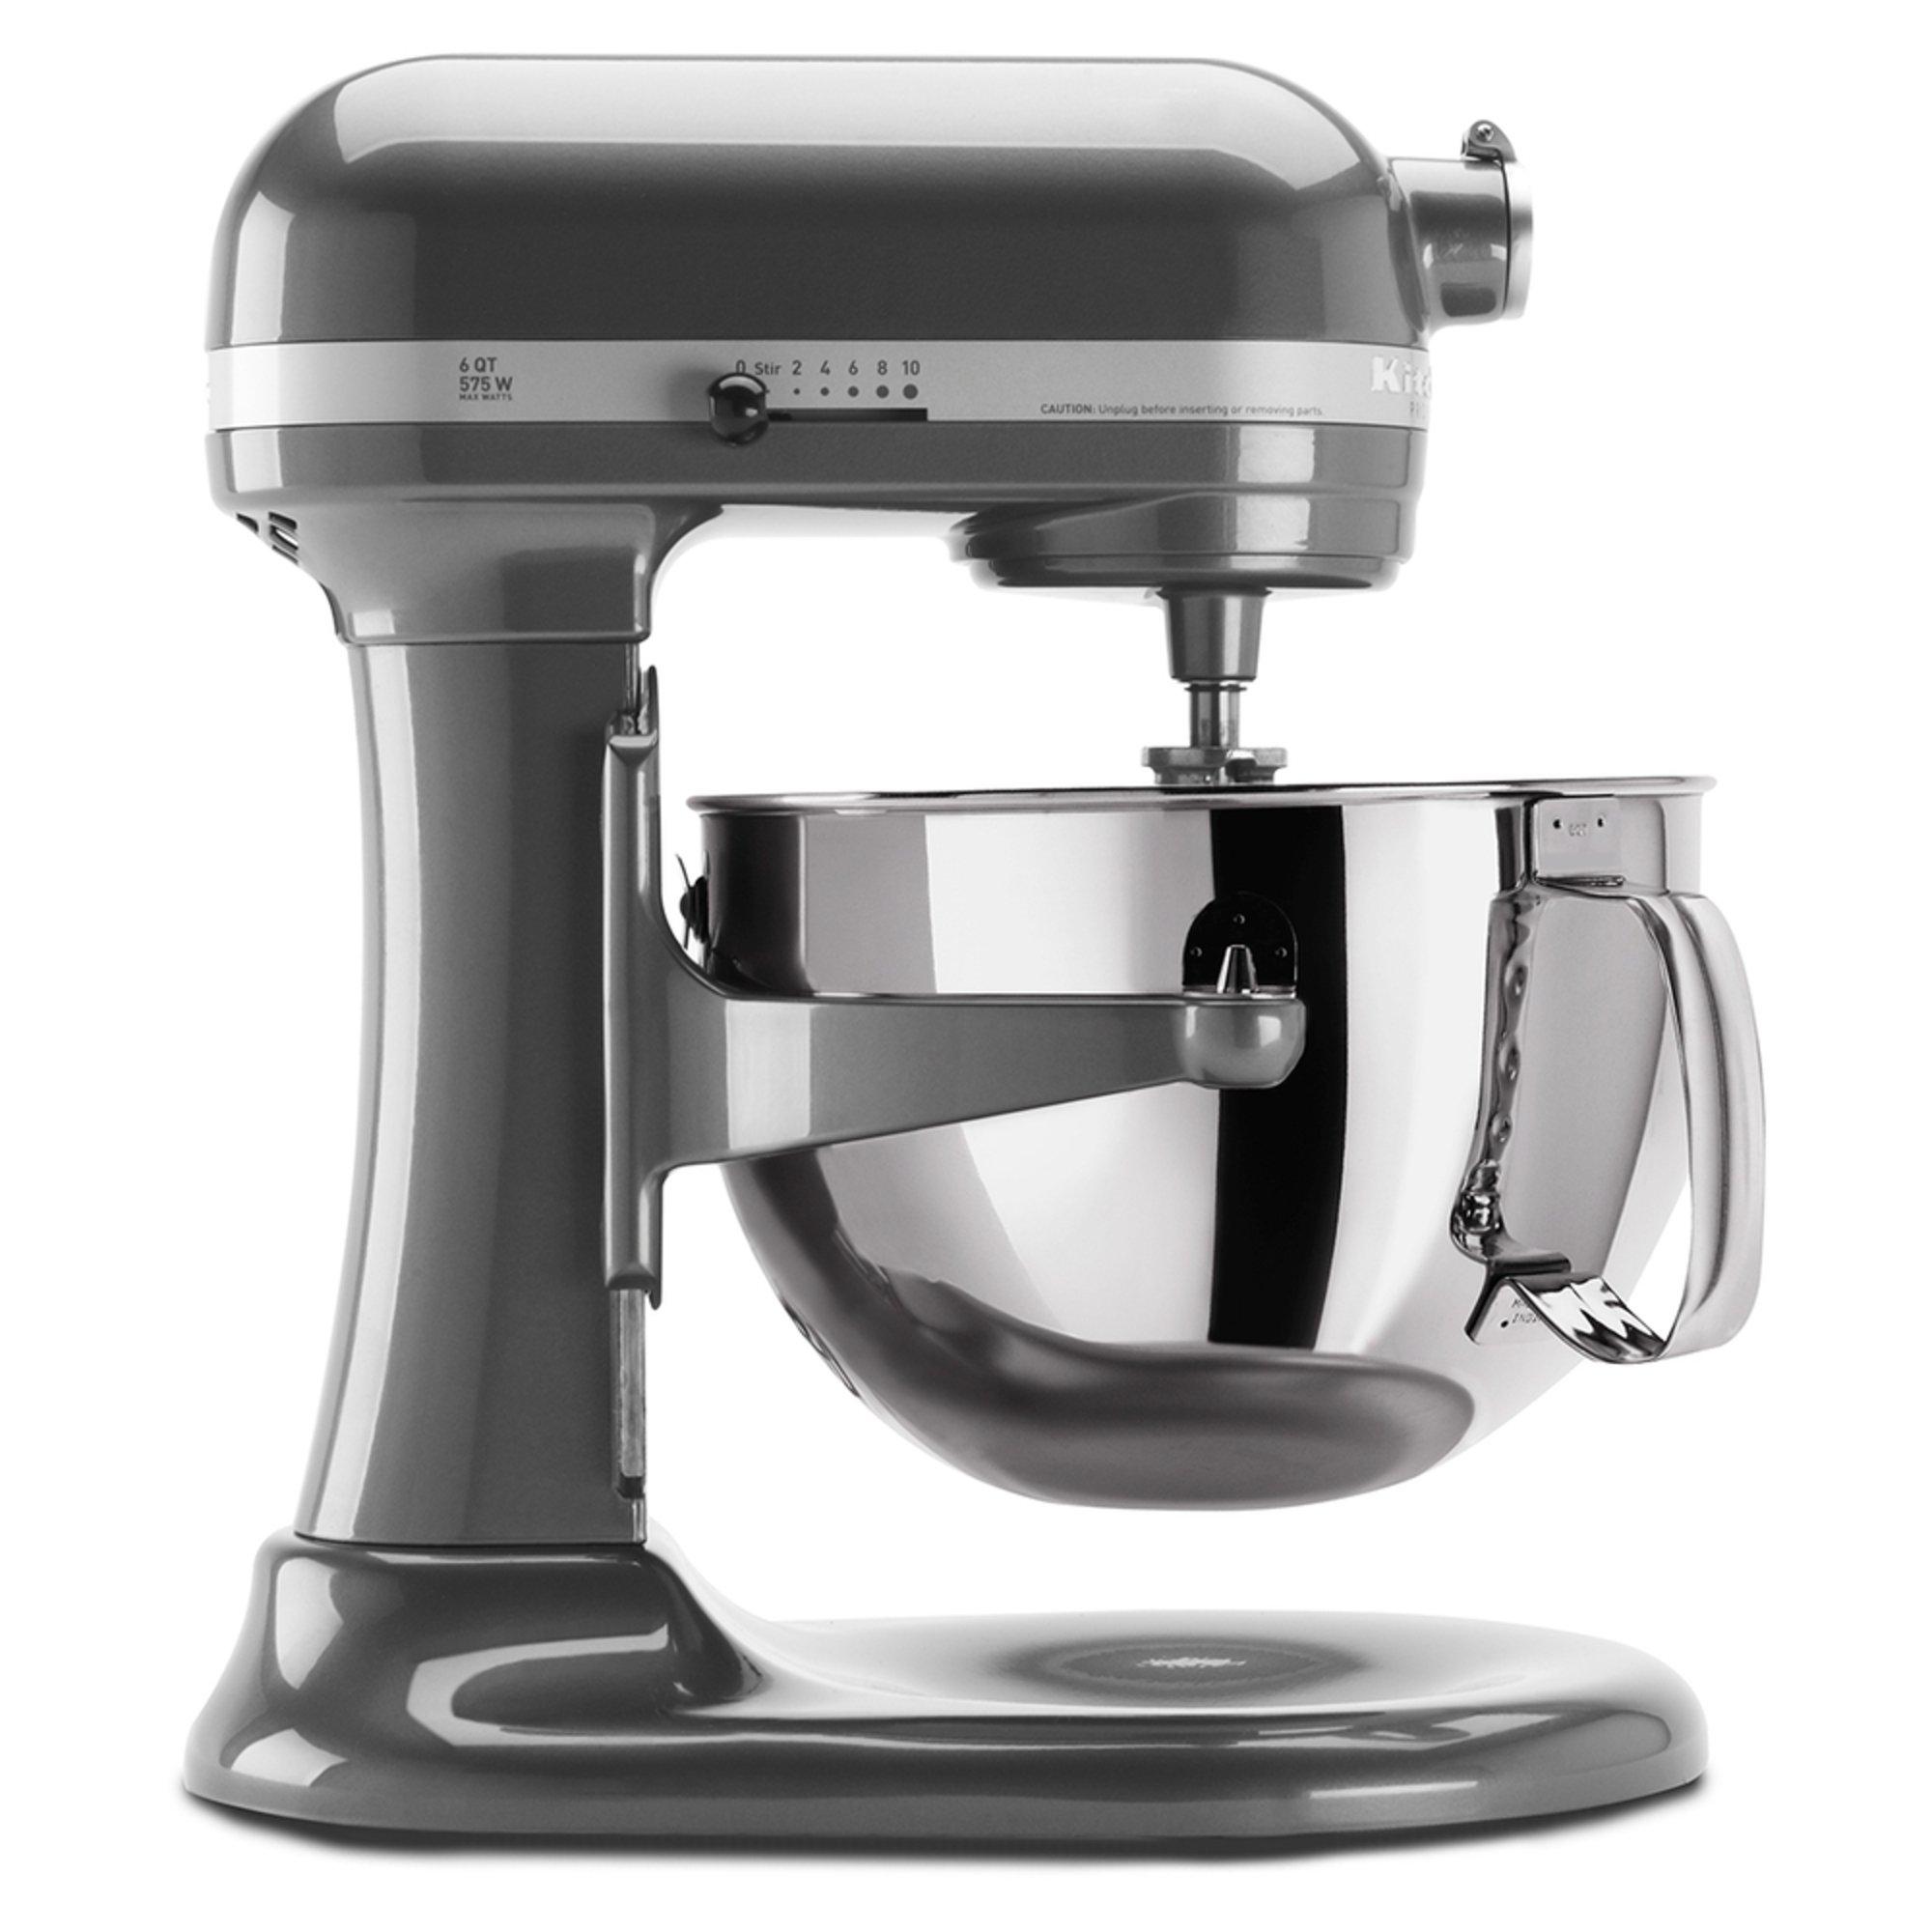 Kitchenaid Professional 600 Series 6 Quart Bowl Lift Stand Mixer Pearl Metallic Kp26m1xpm